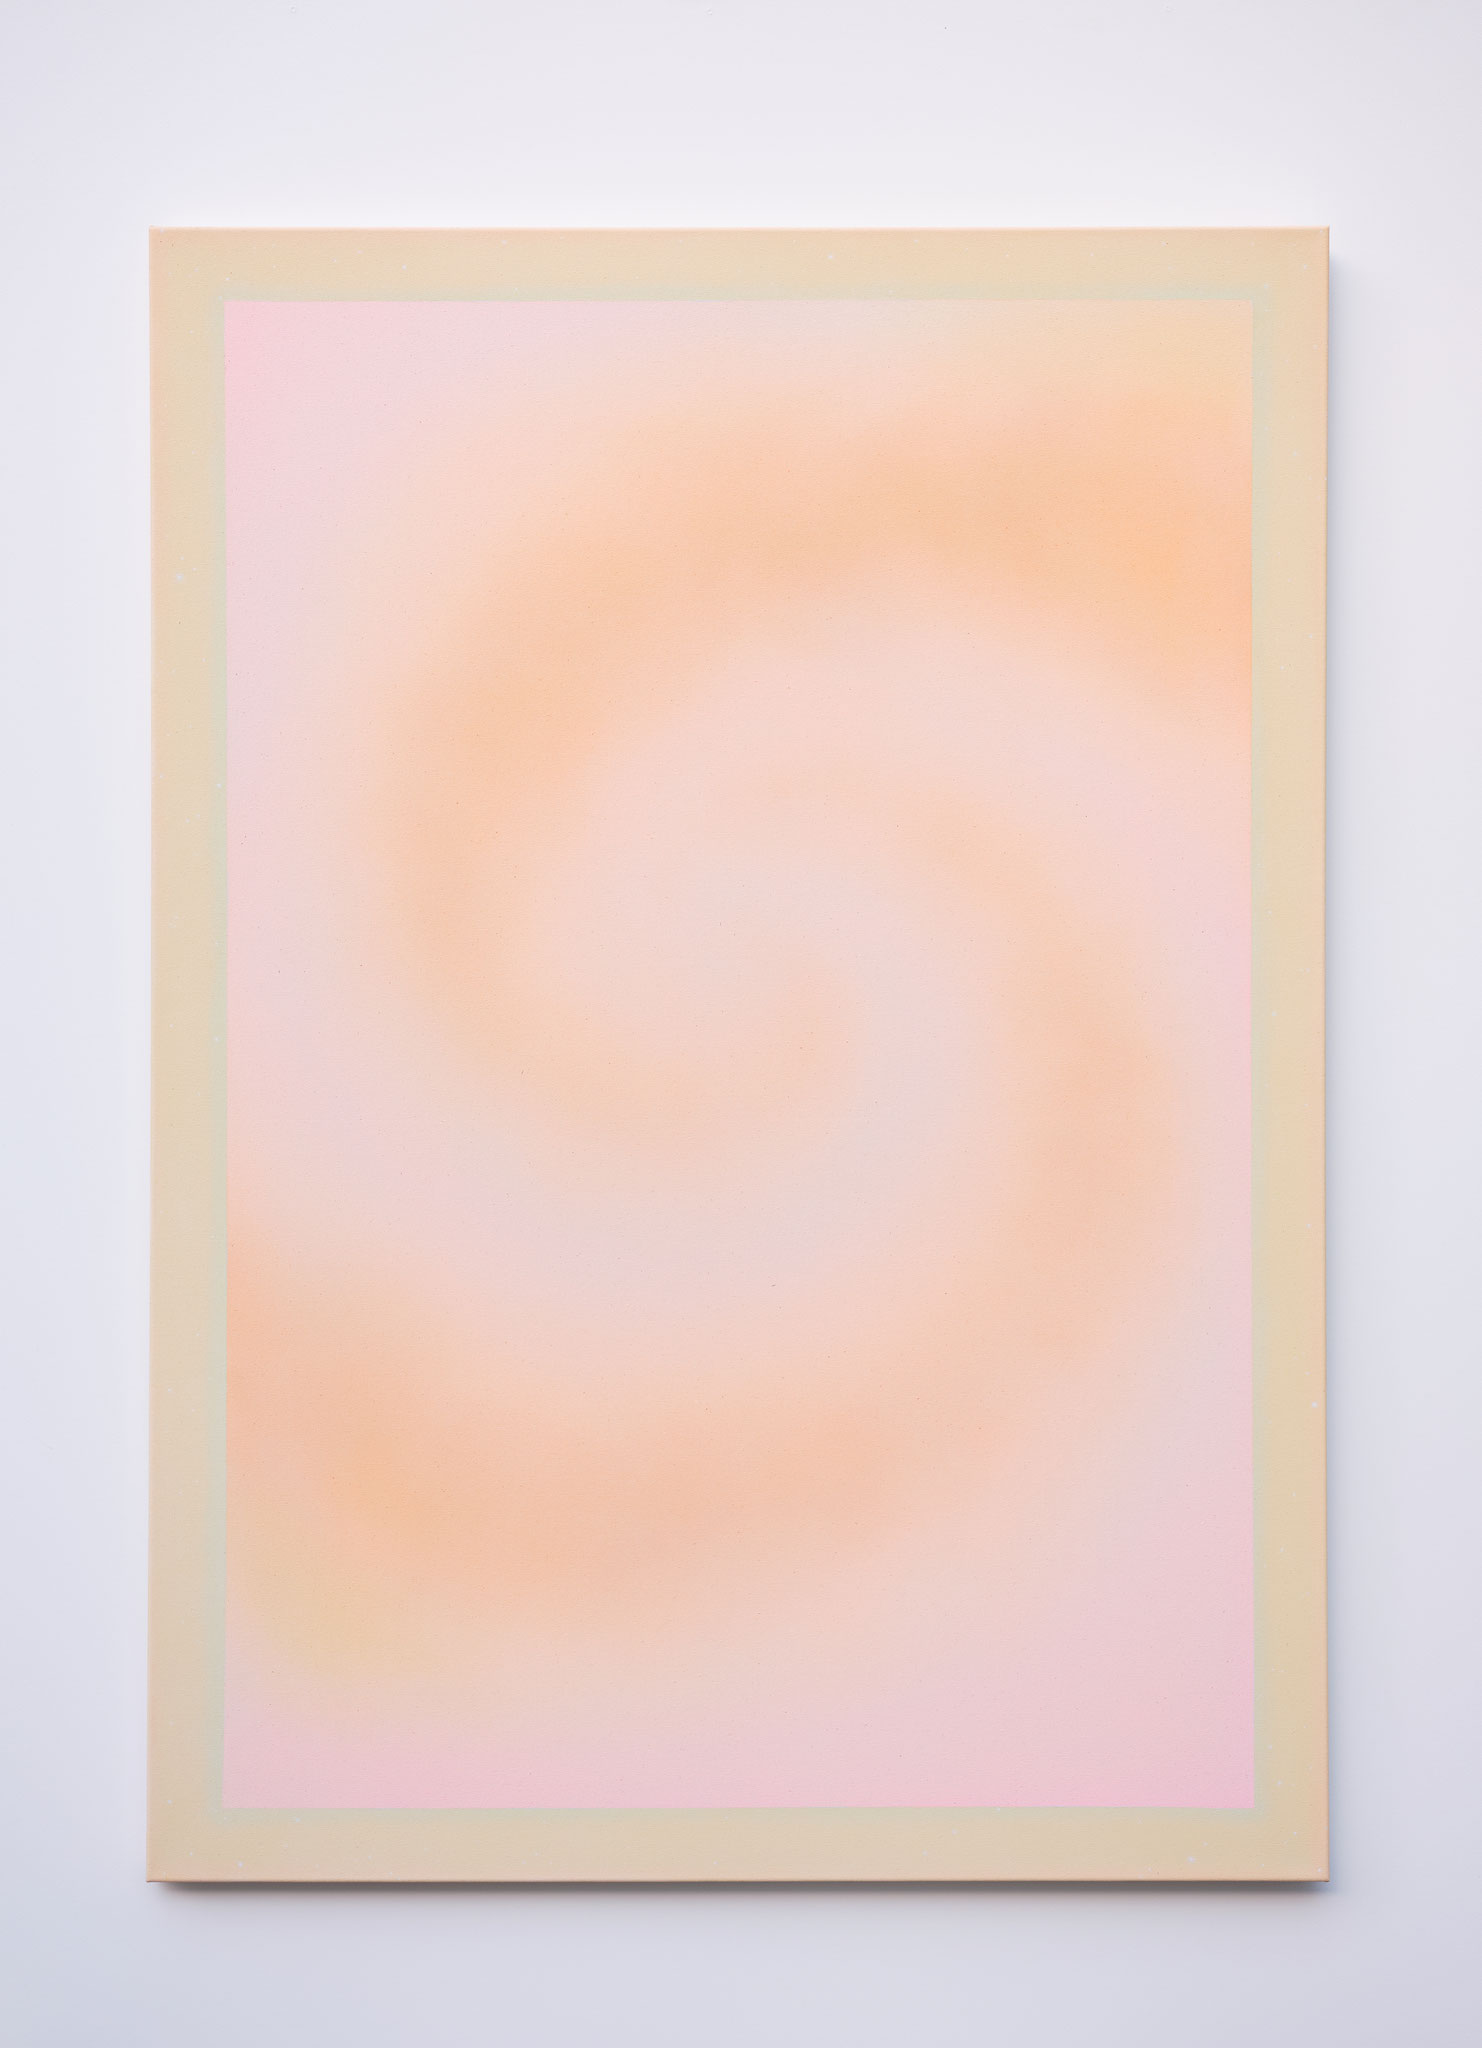 "Alina Birkner ""Untitled (Soft Creation)"" 2018, 170x120 cm, Acrylic on Canvas"